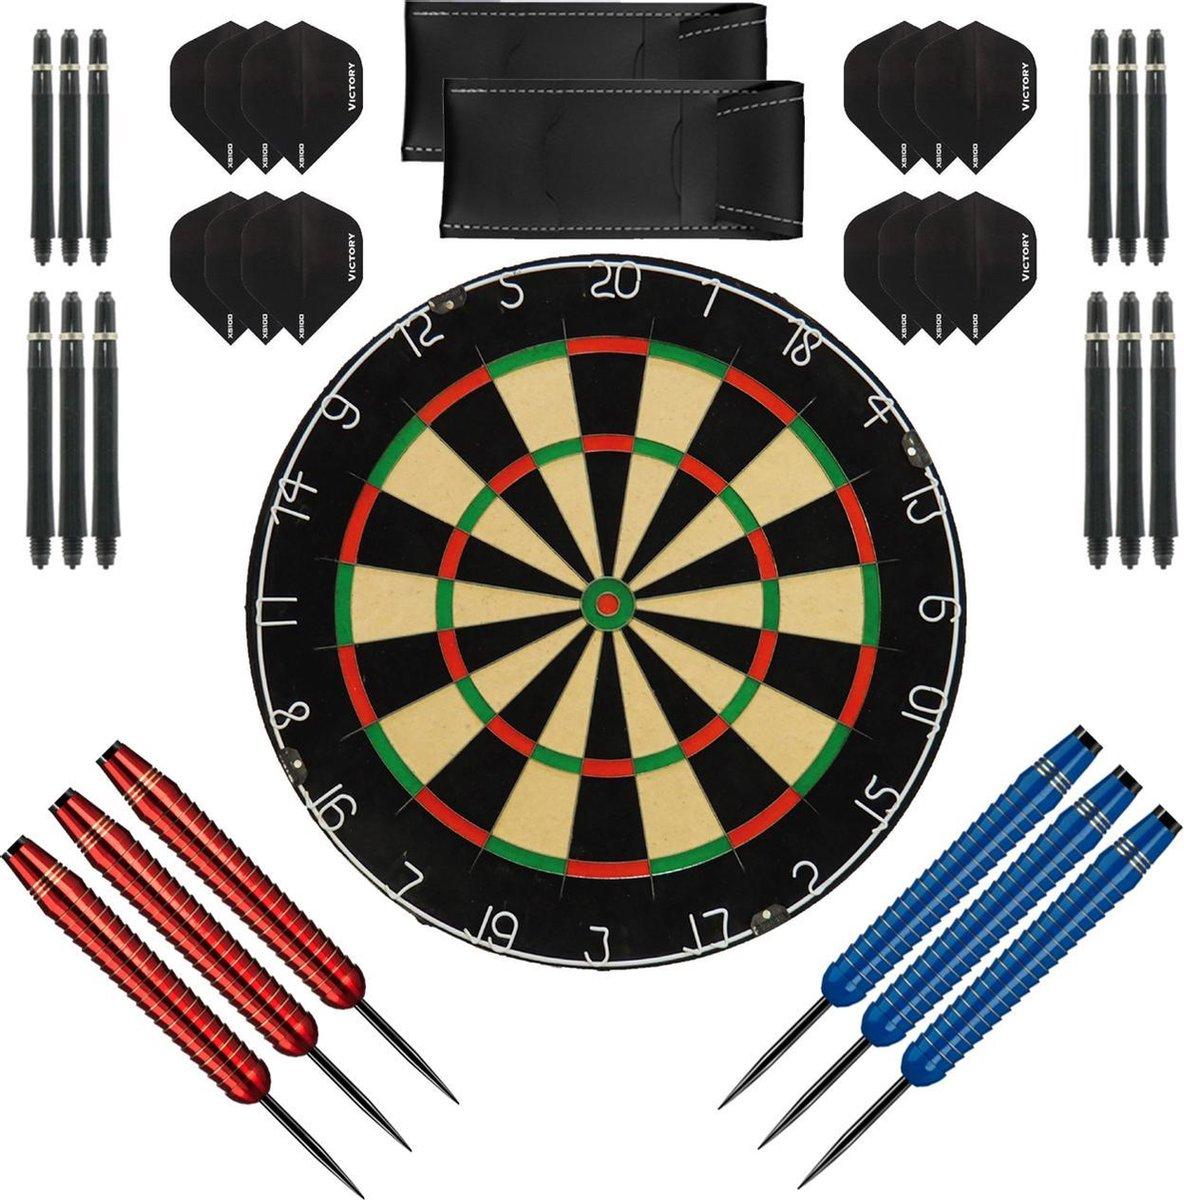 Dragon Darts complete Shark dartset - XQ-Max plain - dartbord - dart shafts - dart flights - dartpijlen 24 gram - 100% brass - 2 sets - dartpijlen - rood-blauw